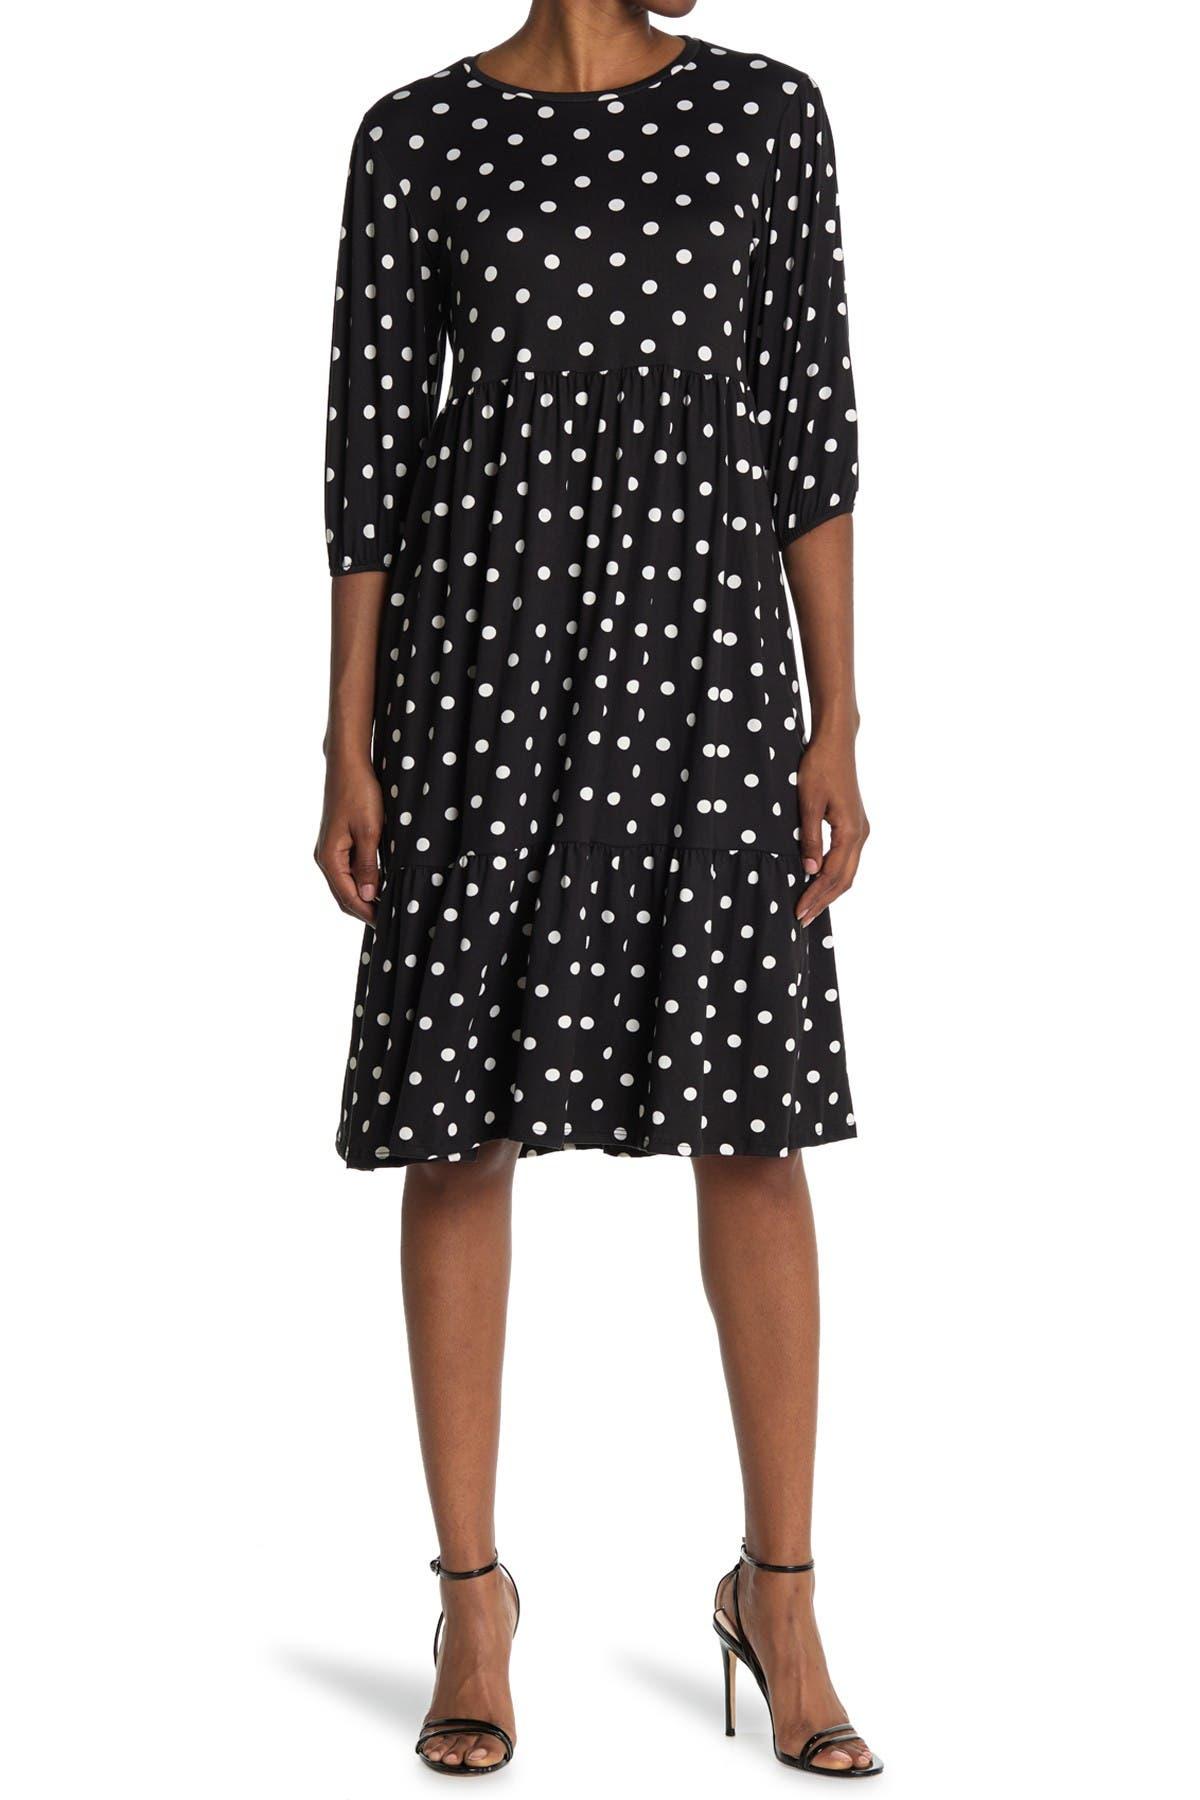 Image of Velvet Torch Polka Dot Print Tiered Midi Dress